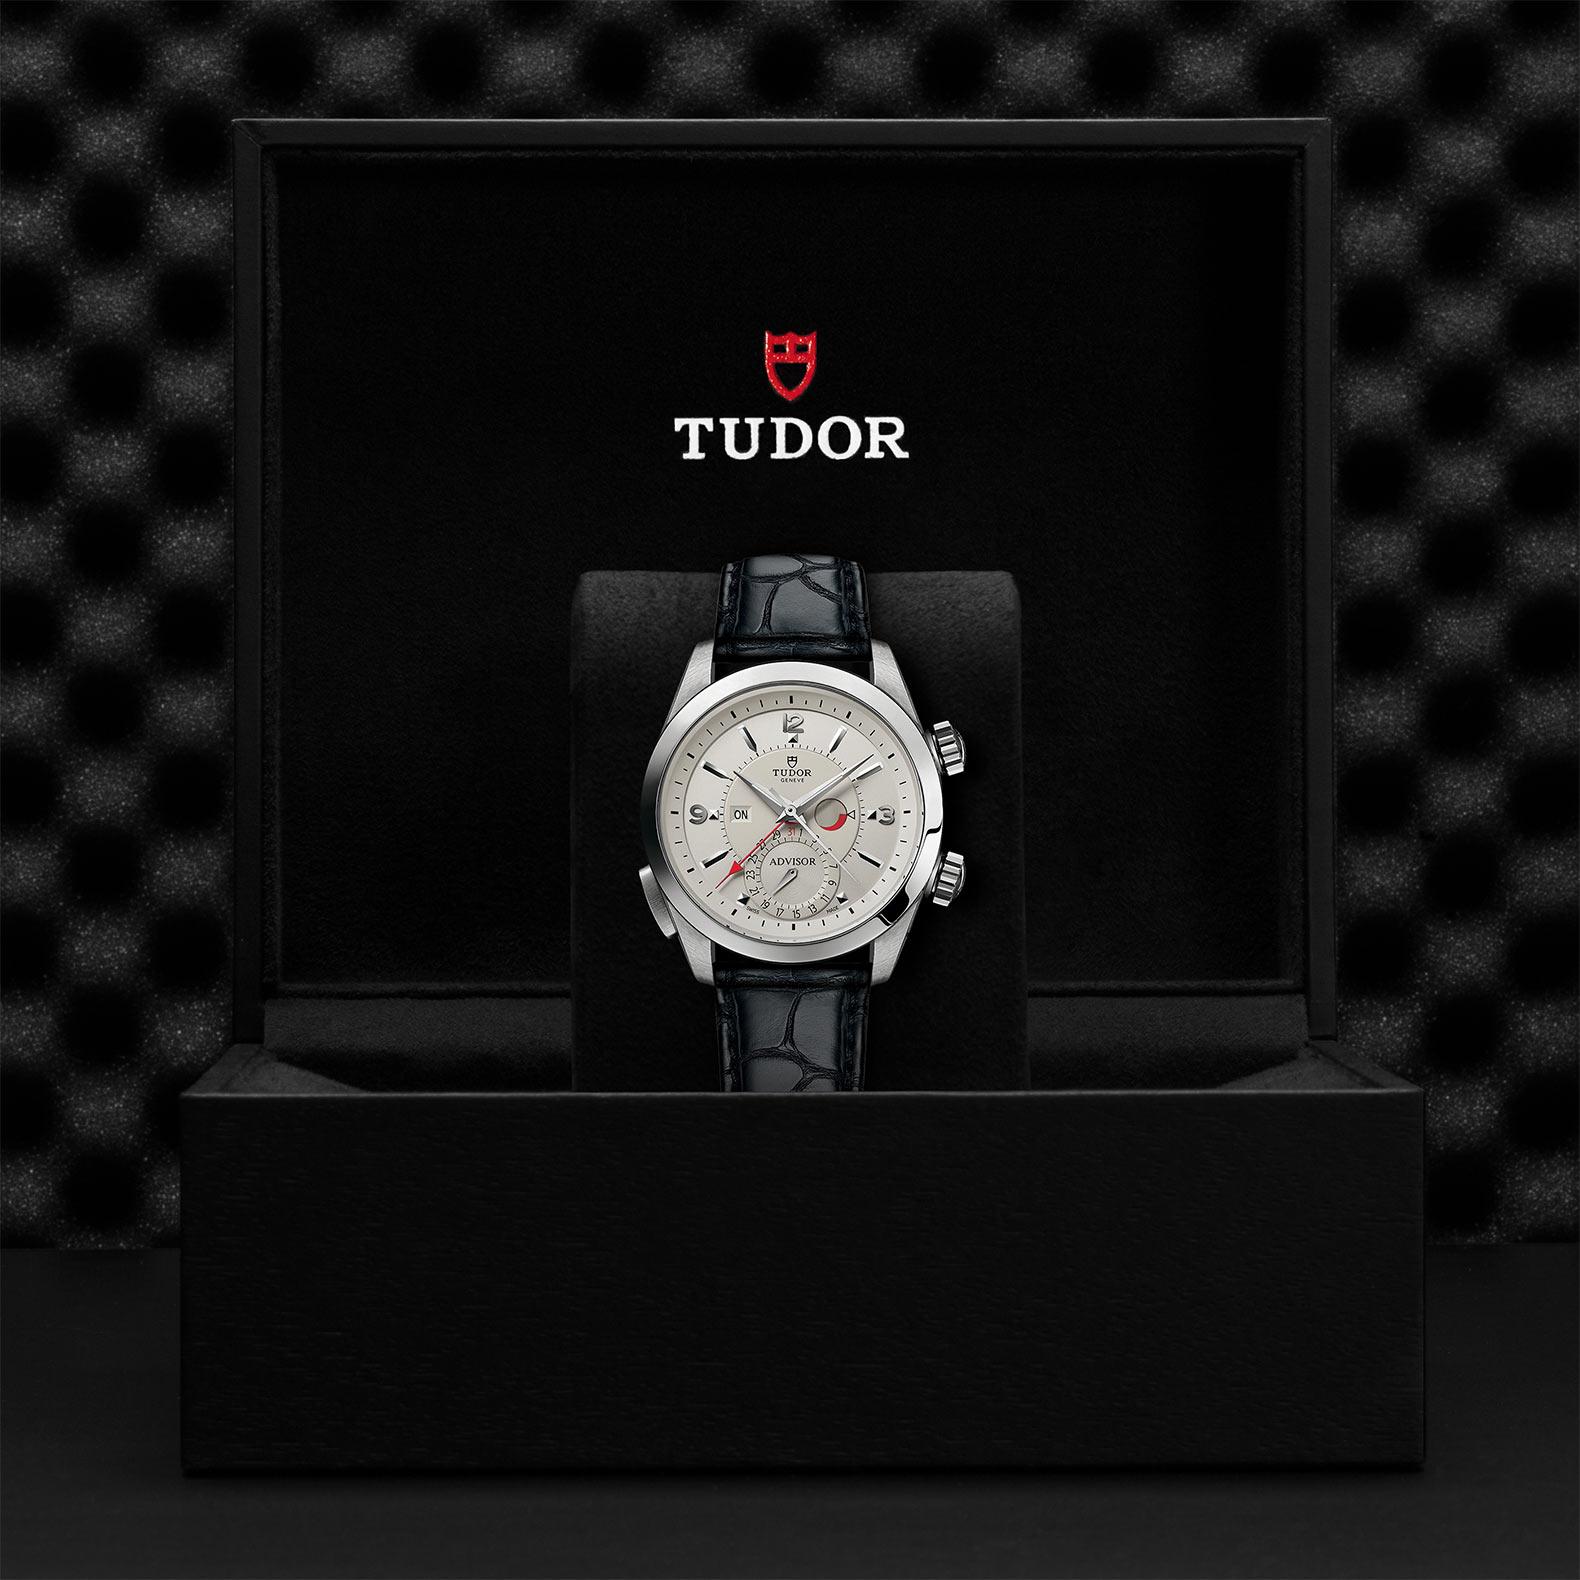 TUDOR Heritage Advisor - M79620T-0011